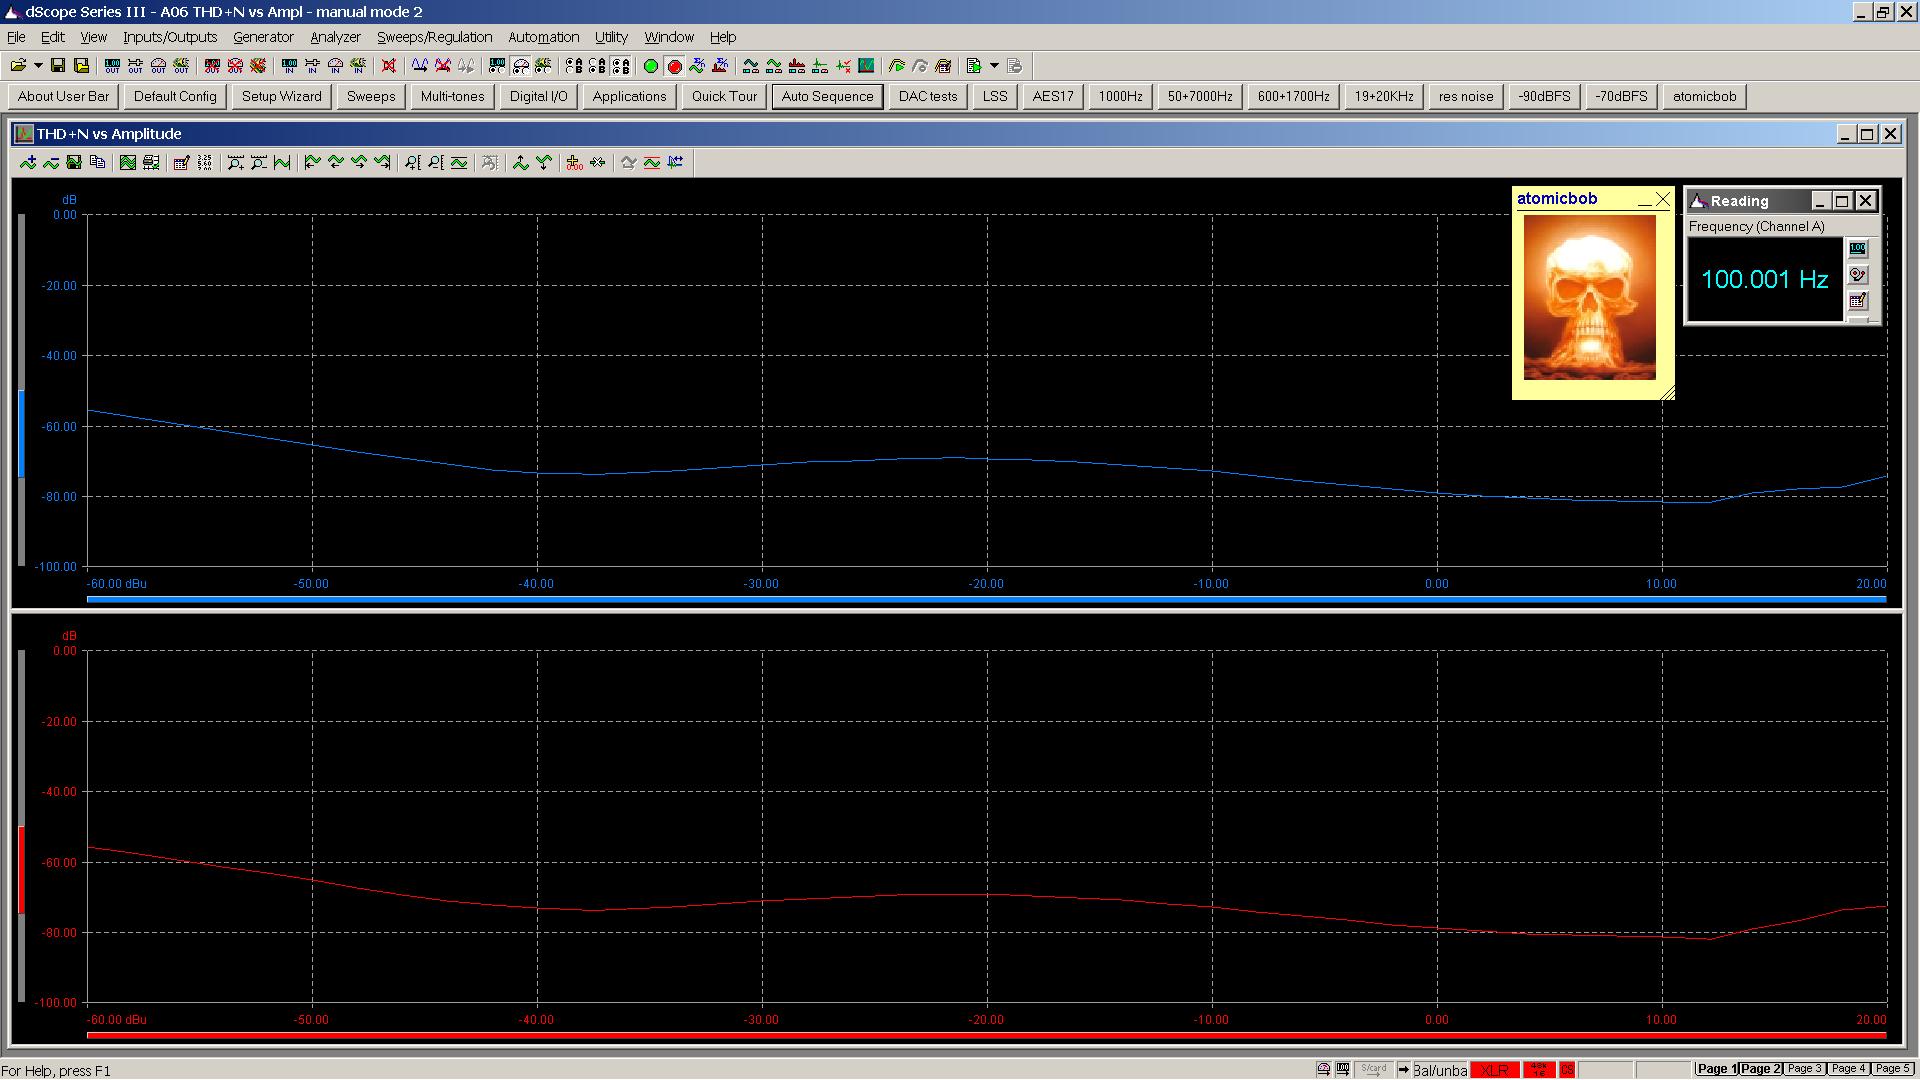 20181030 ISO Twin 100 Hz THD+N vs Amplitude 100K - v2.png